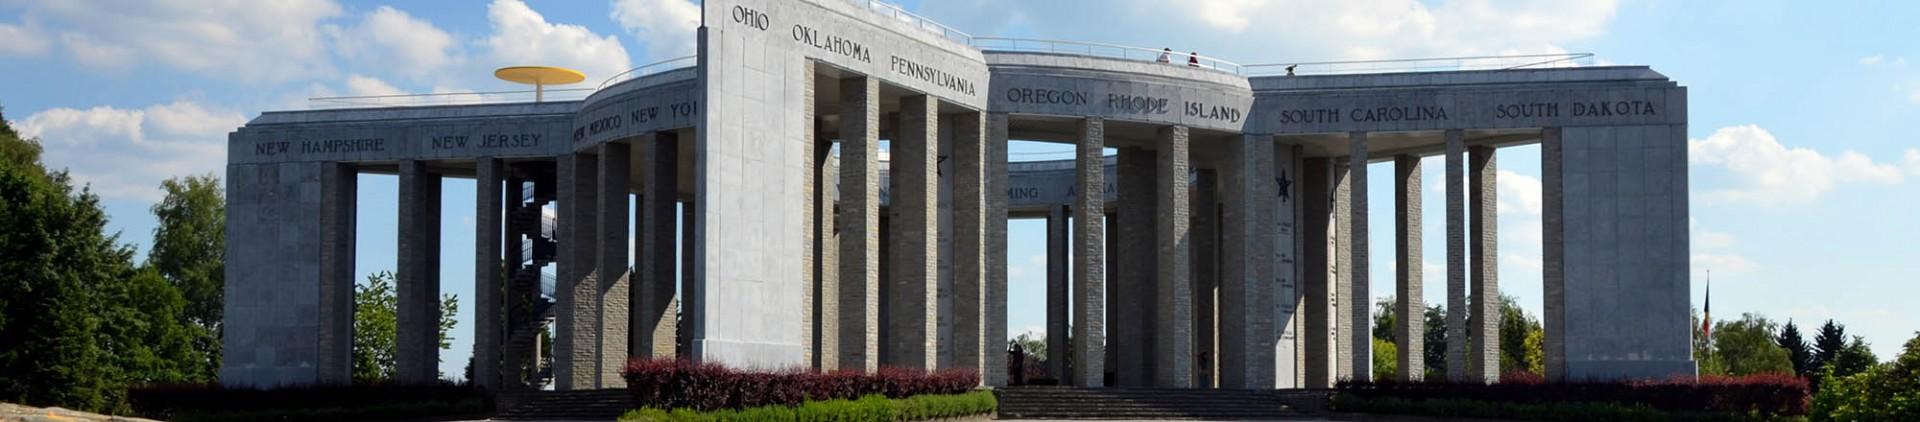 LAND OF MEMORY für Gruppen - Belgien